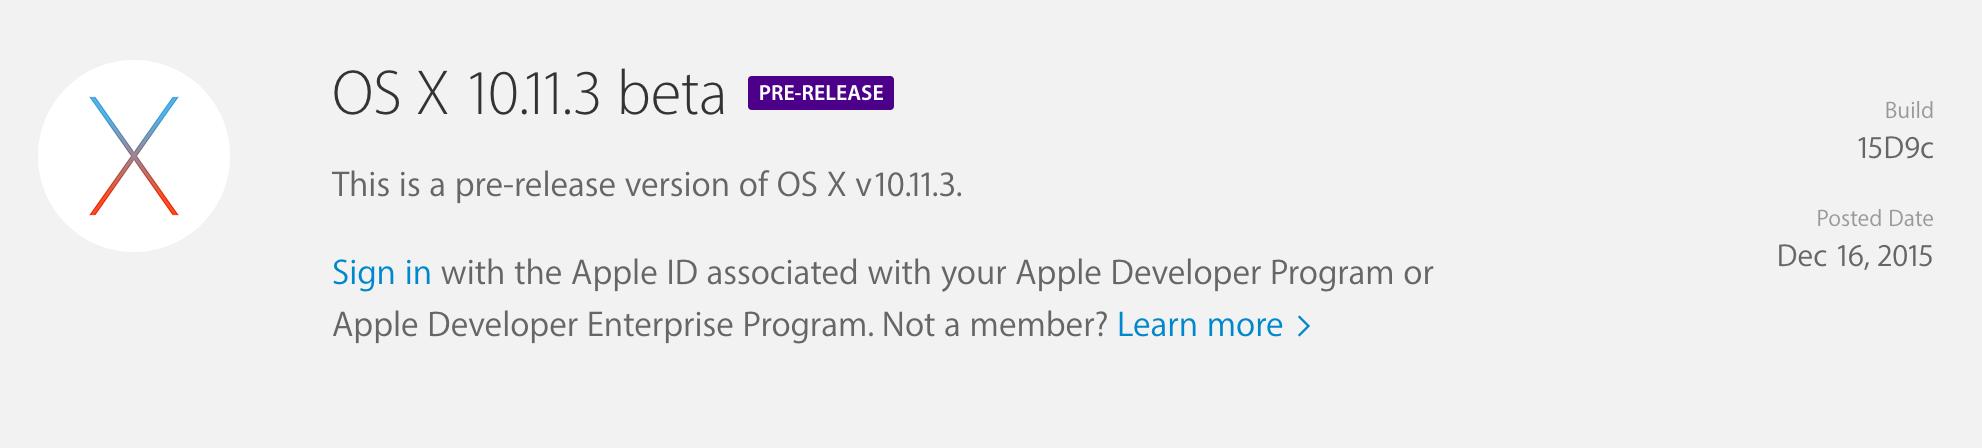 OS X 10.11.3 beta, iOS 9.2.1 beta 업데이트 개발자들에게 공개.